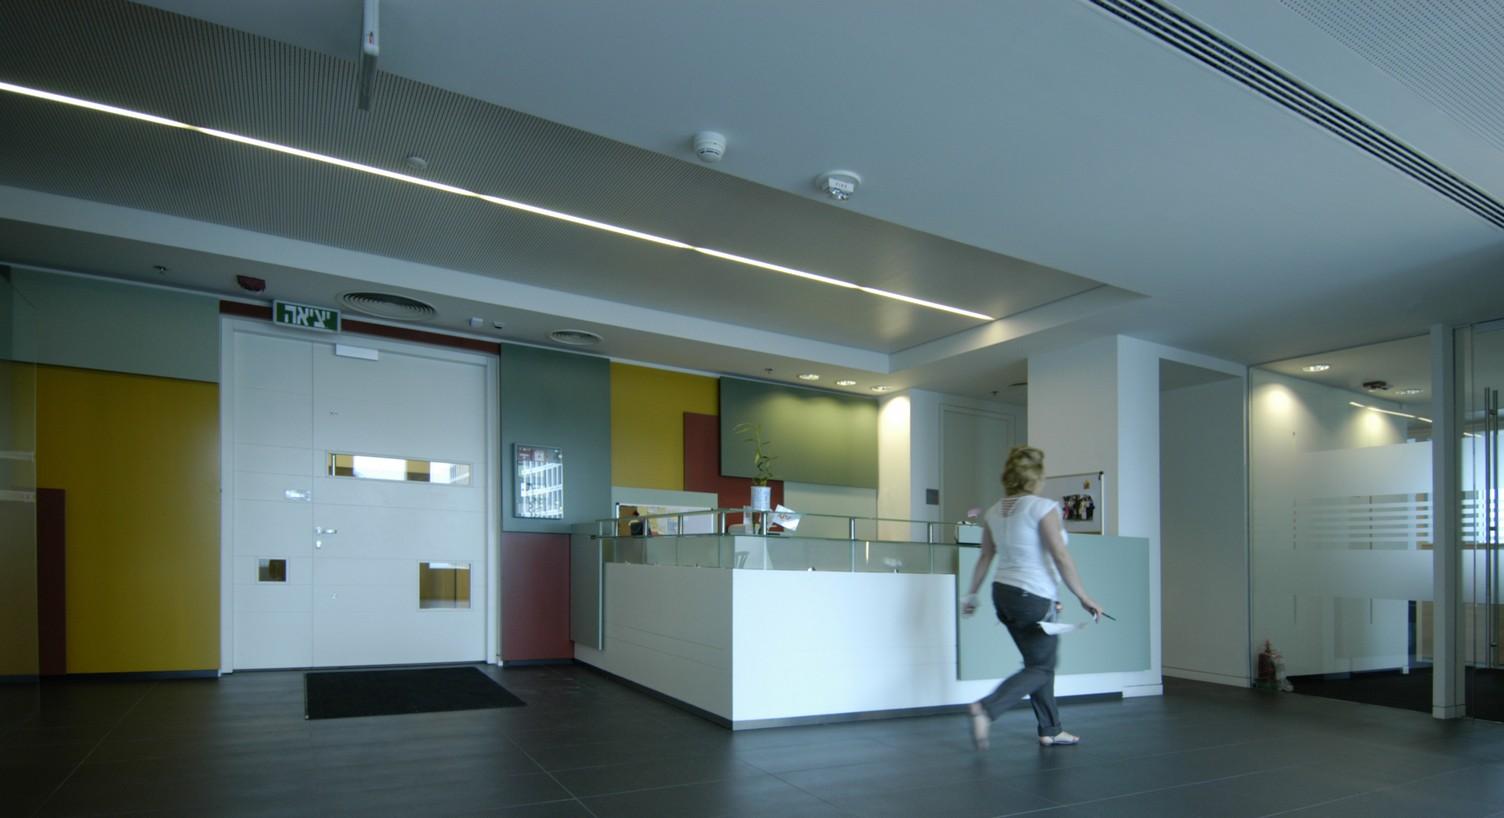 DSC_0077-xiv-entrance lobby